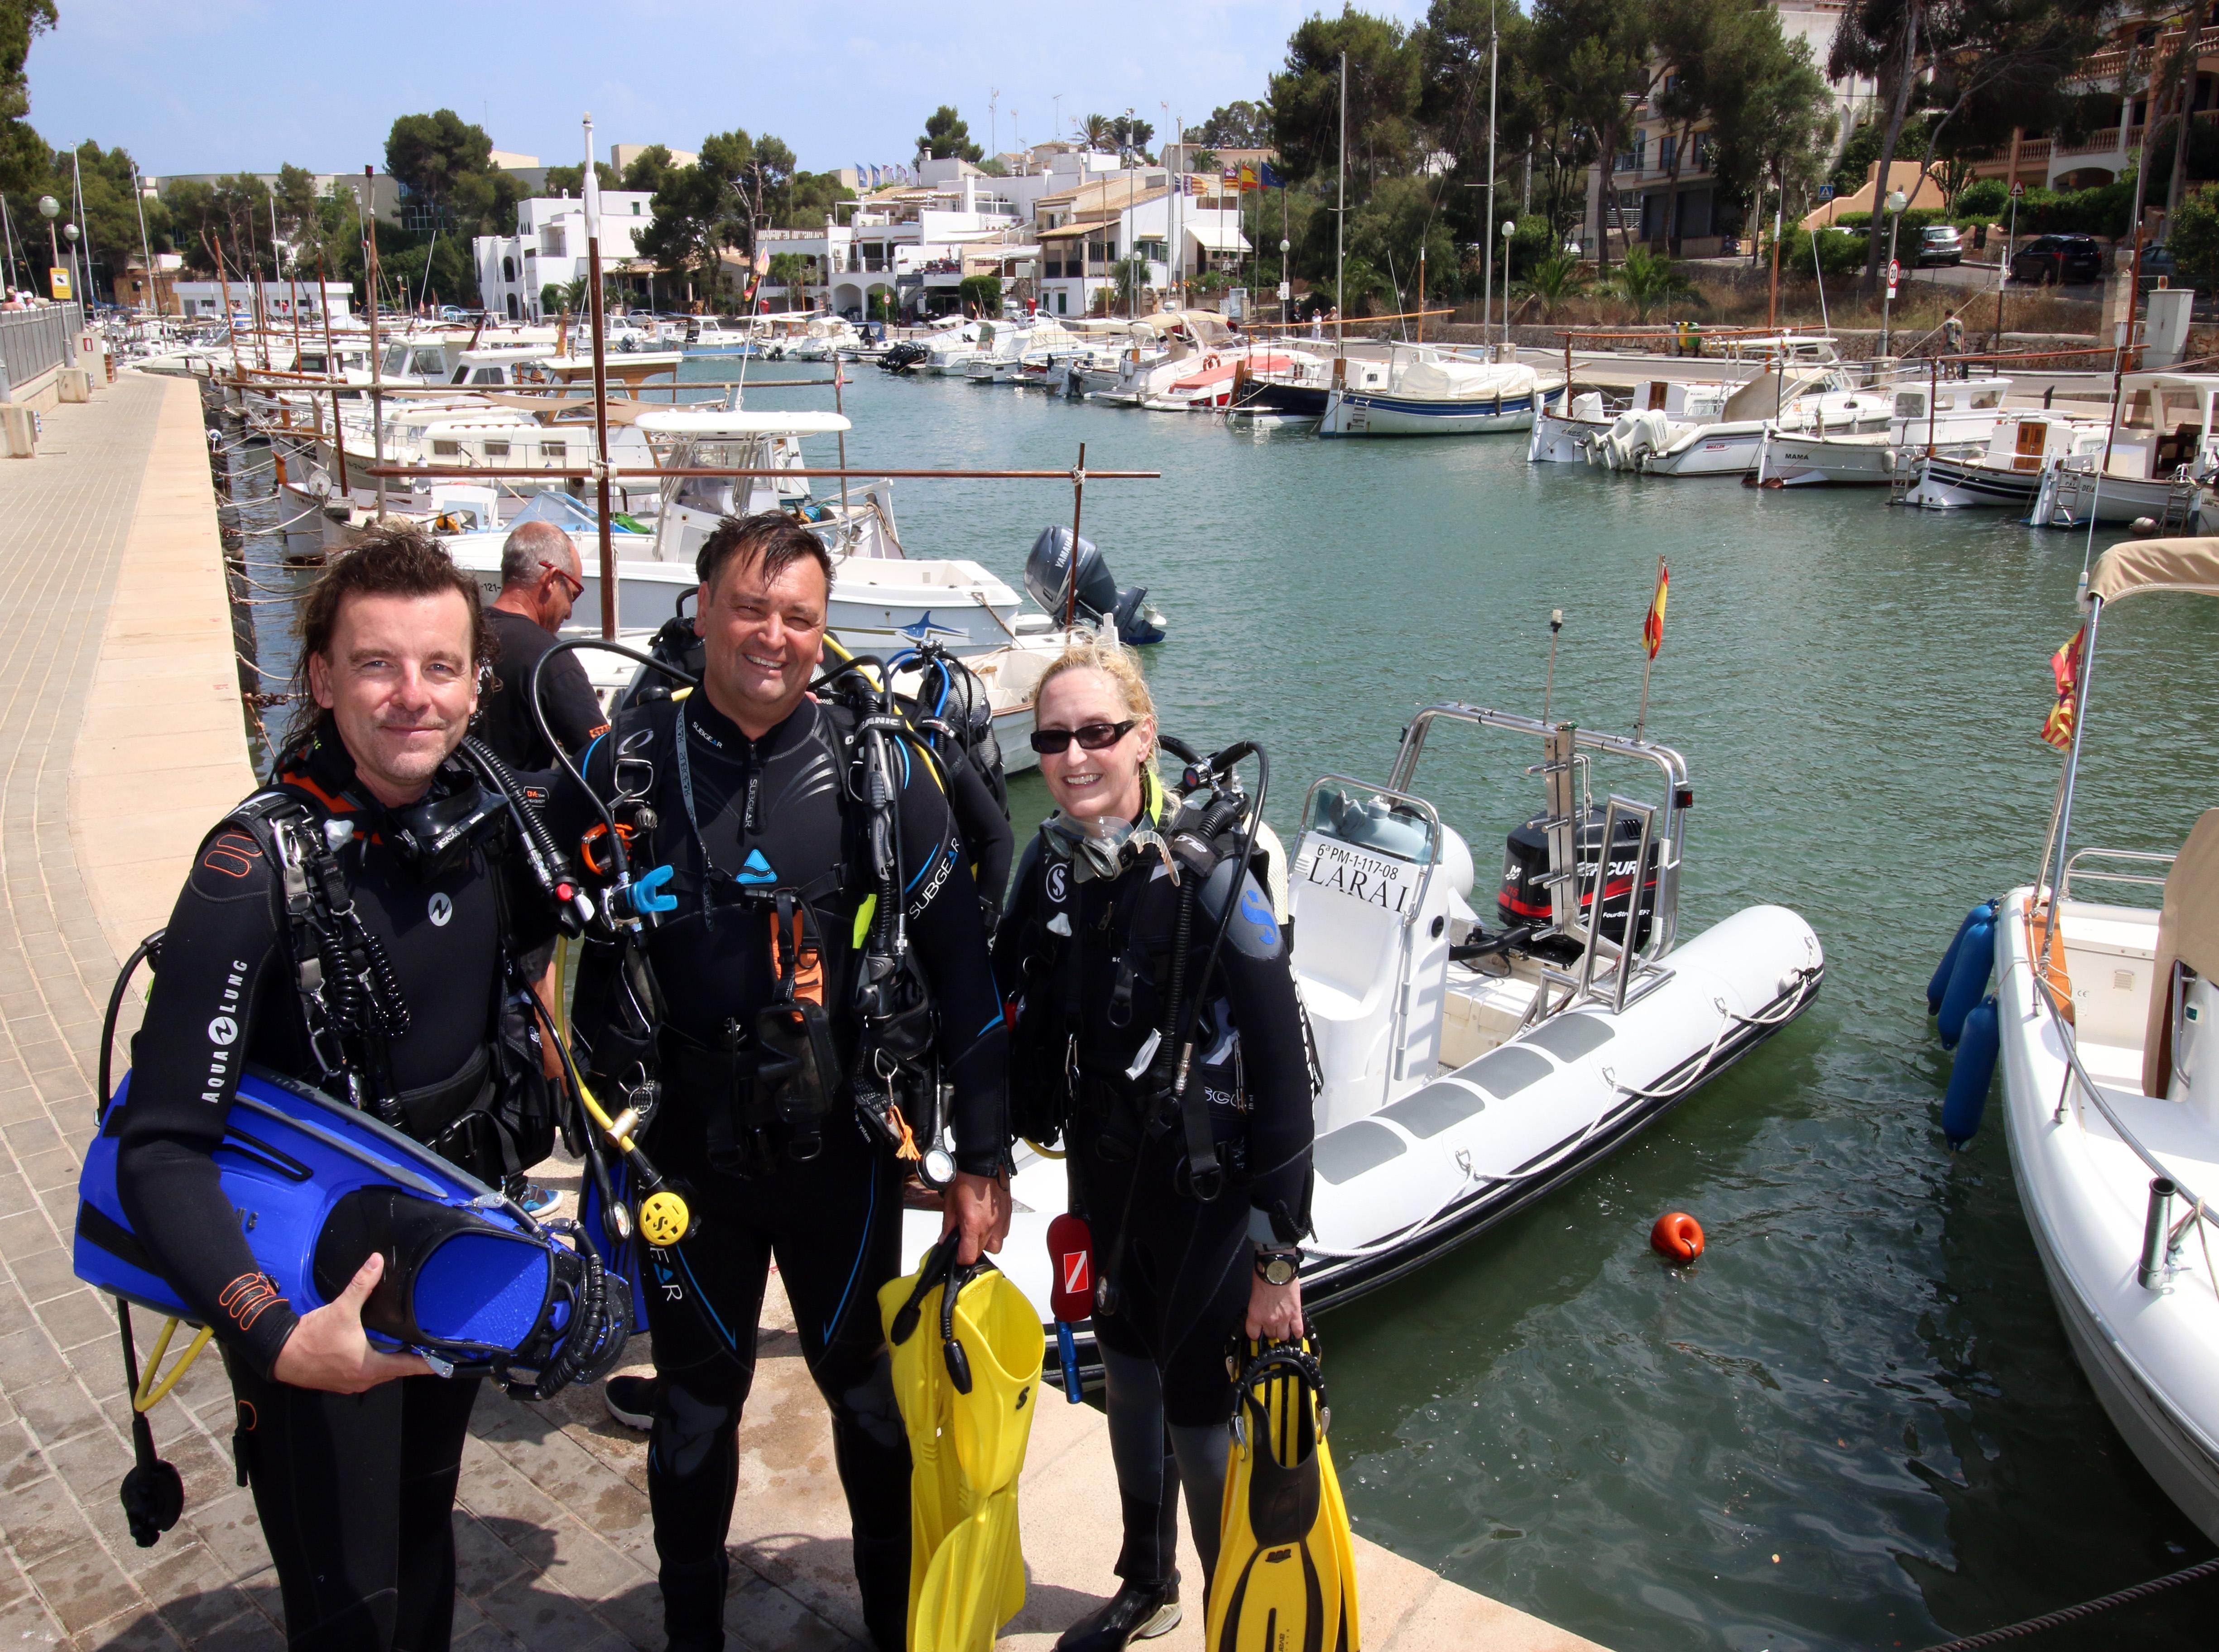 TAUCHEN-Redakteur Michael Krüger, Petro-Divers-Chef Ralf Detter und Bettina Bormann in Porto Petro. Foto: R. Bartelt